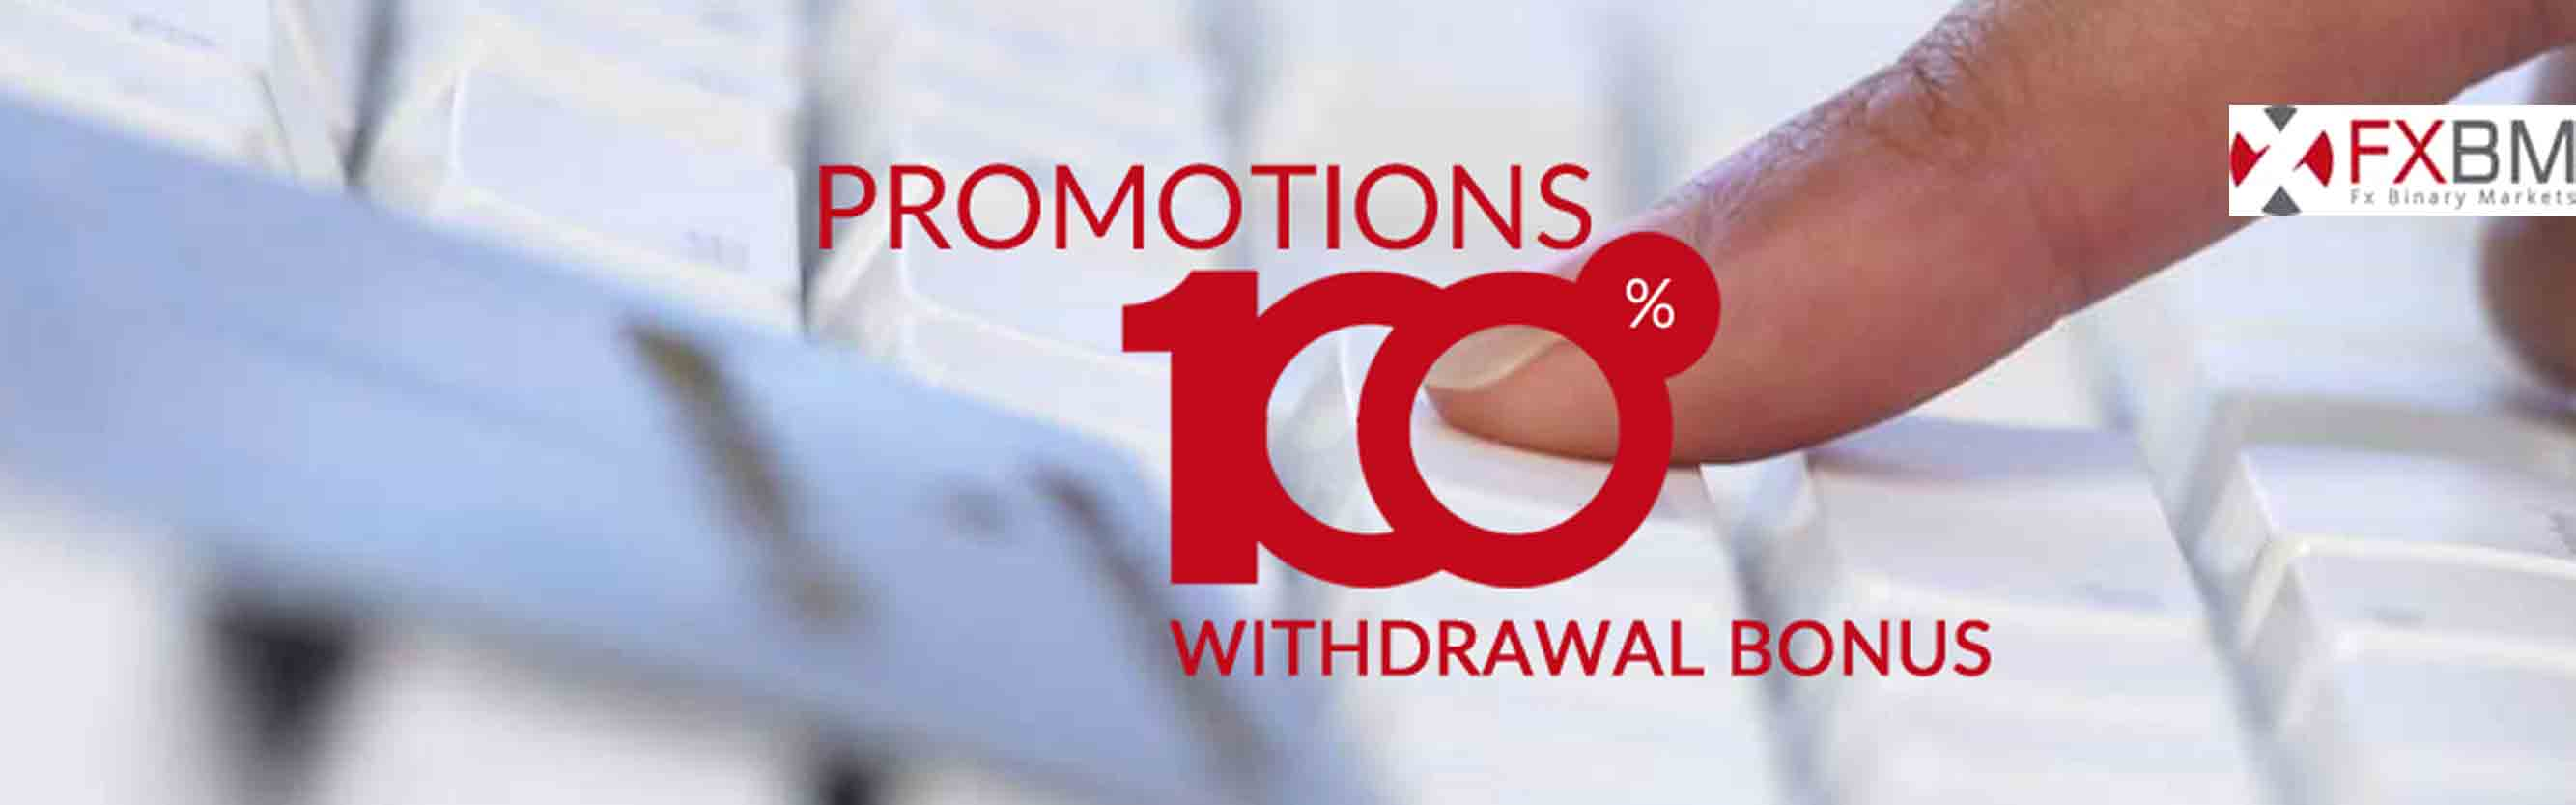 fxbm-100%-Withdrawal-bonus